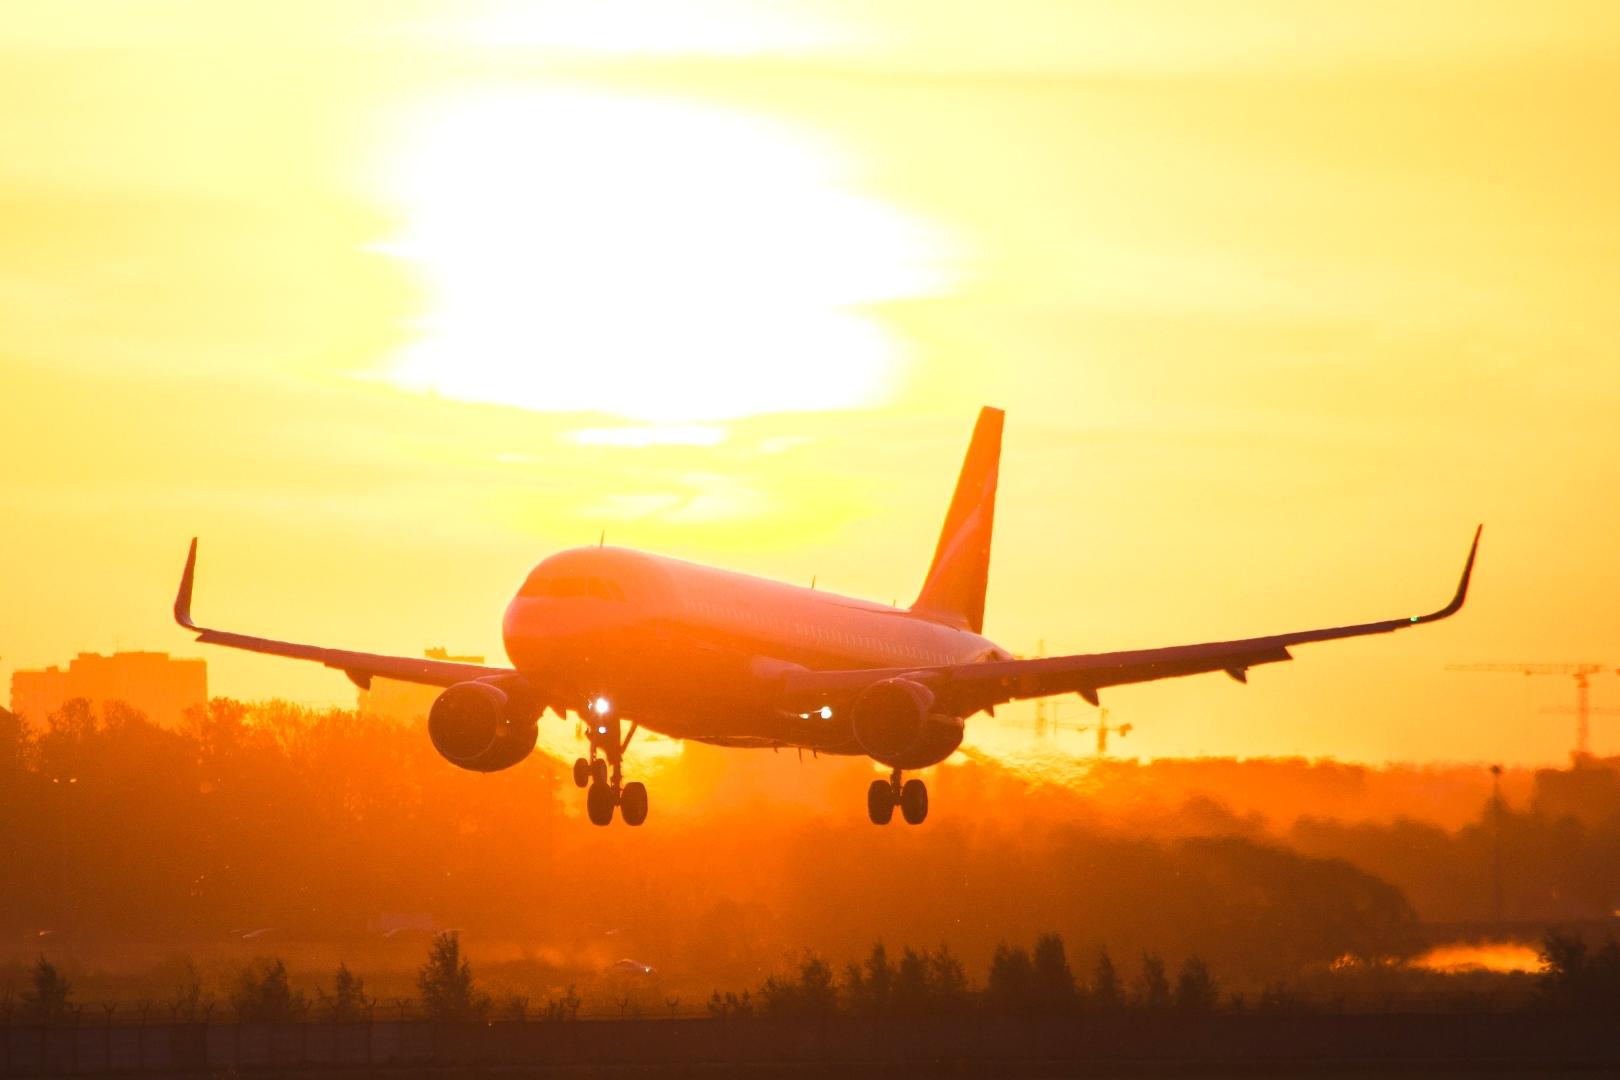 Самолет по маршруту Москва - Геленджик